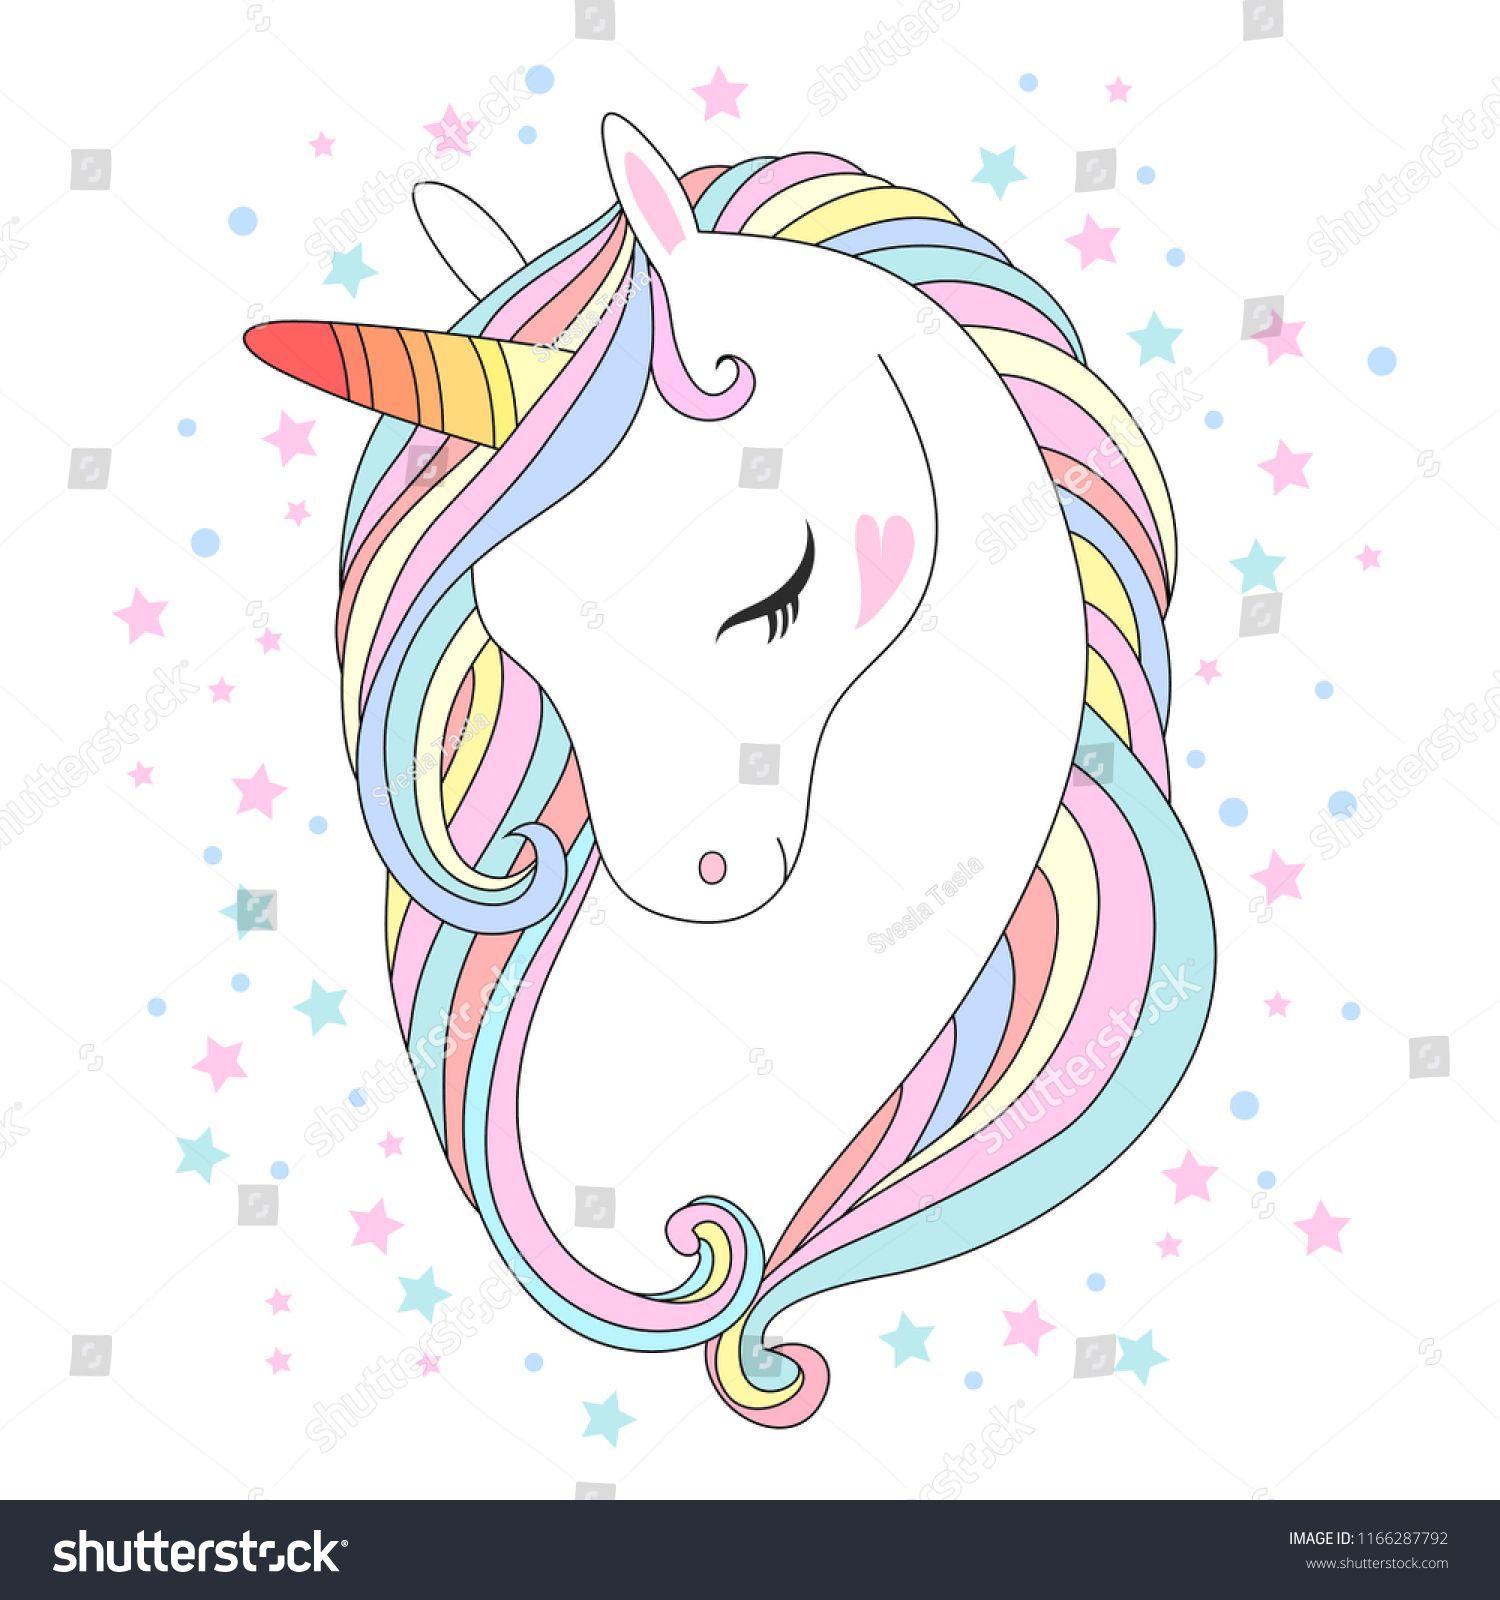 White unicorn head vector illustration. Cute pony face